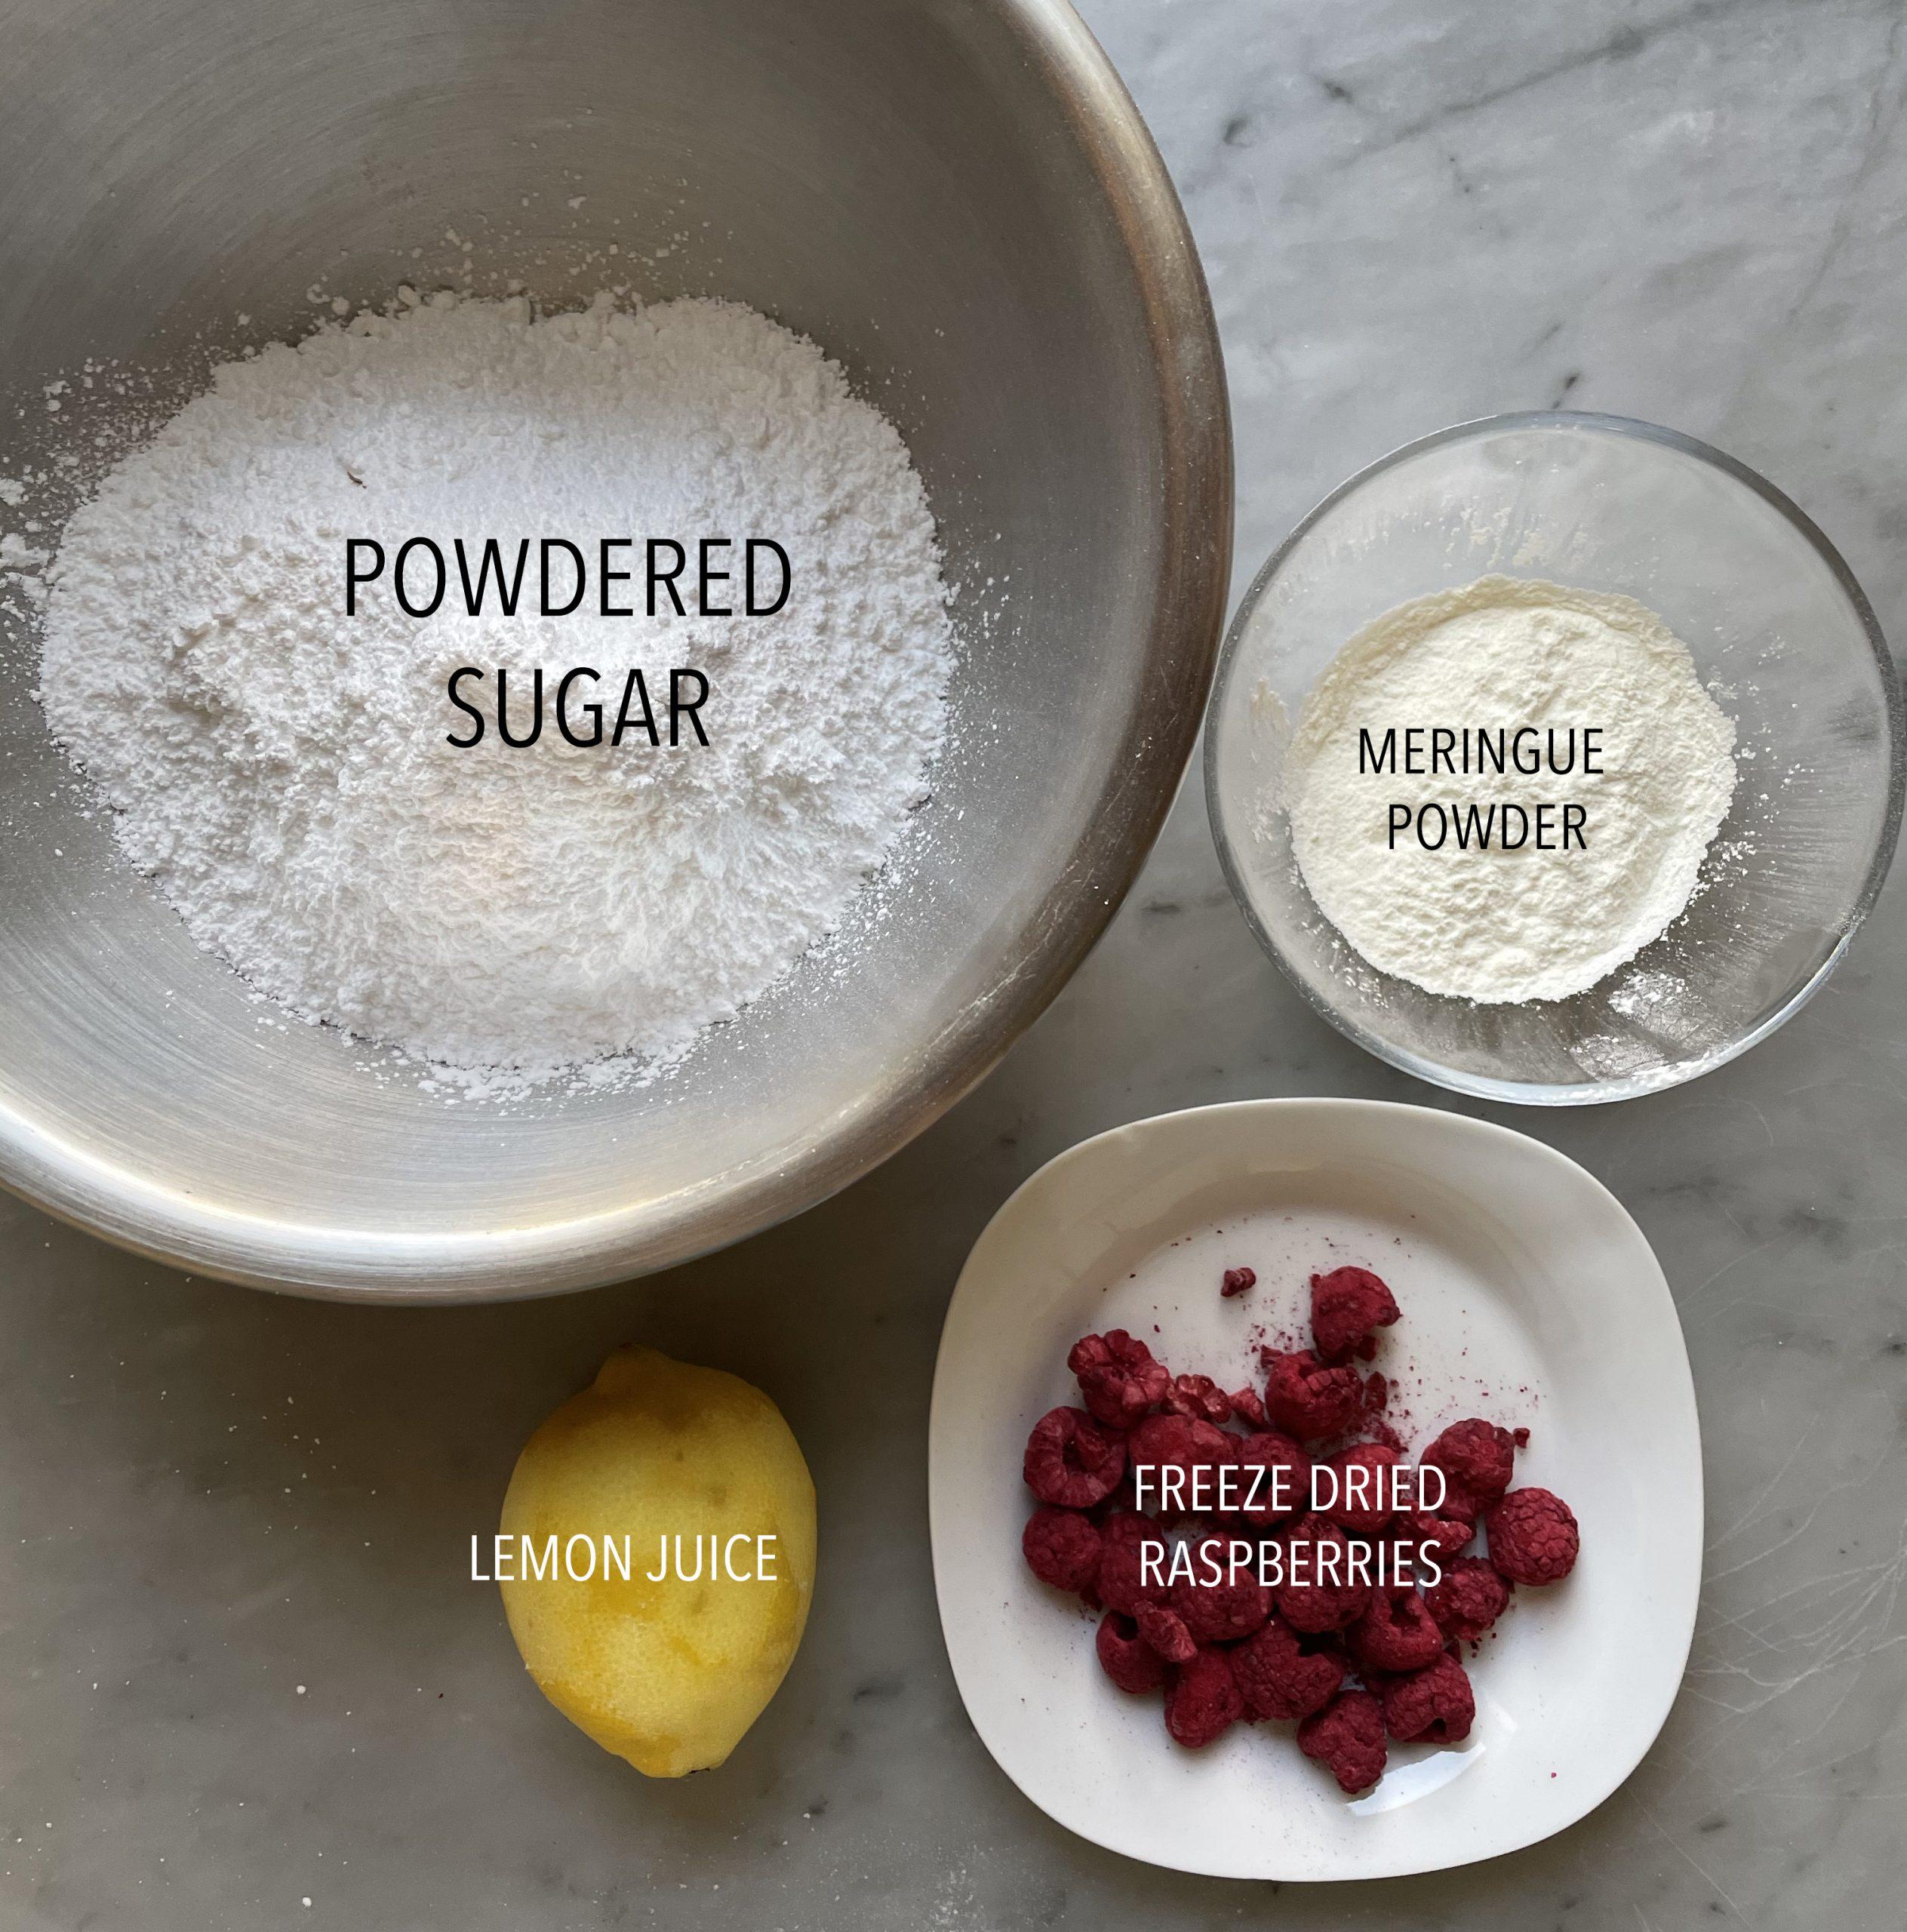 Image of Lemon Cookie decoration ingredients